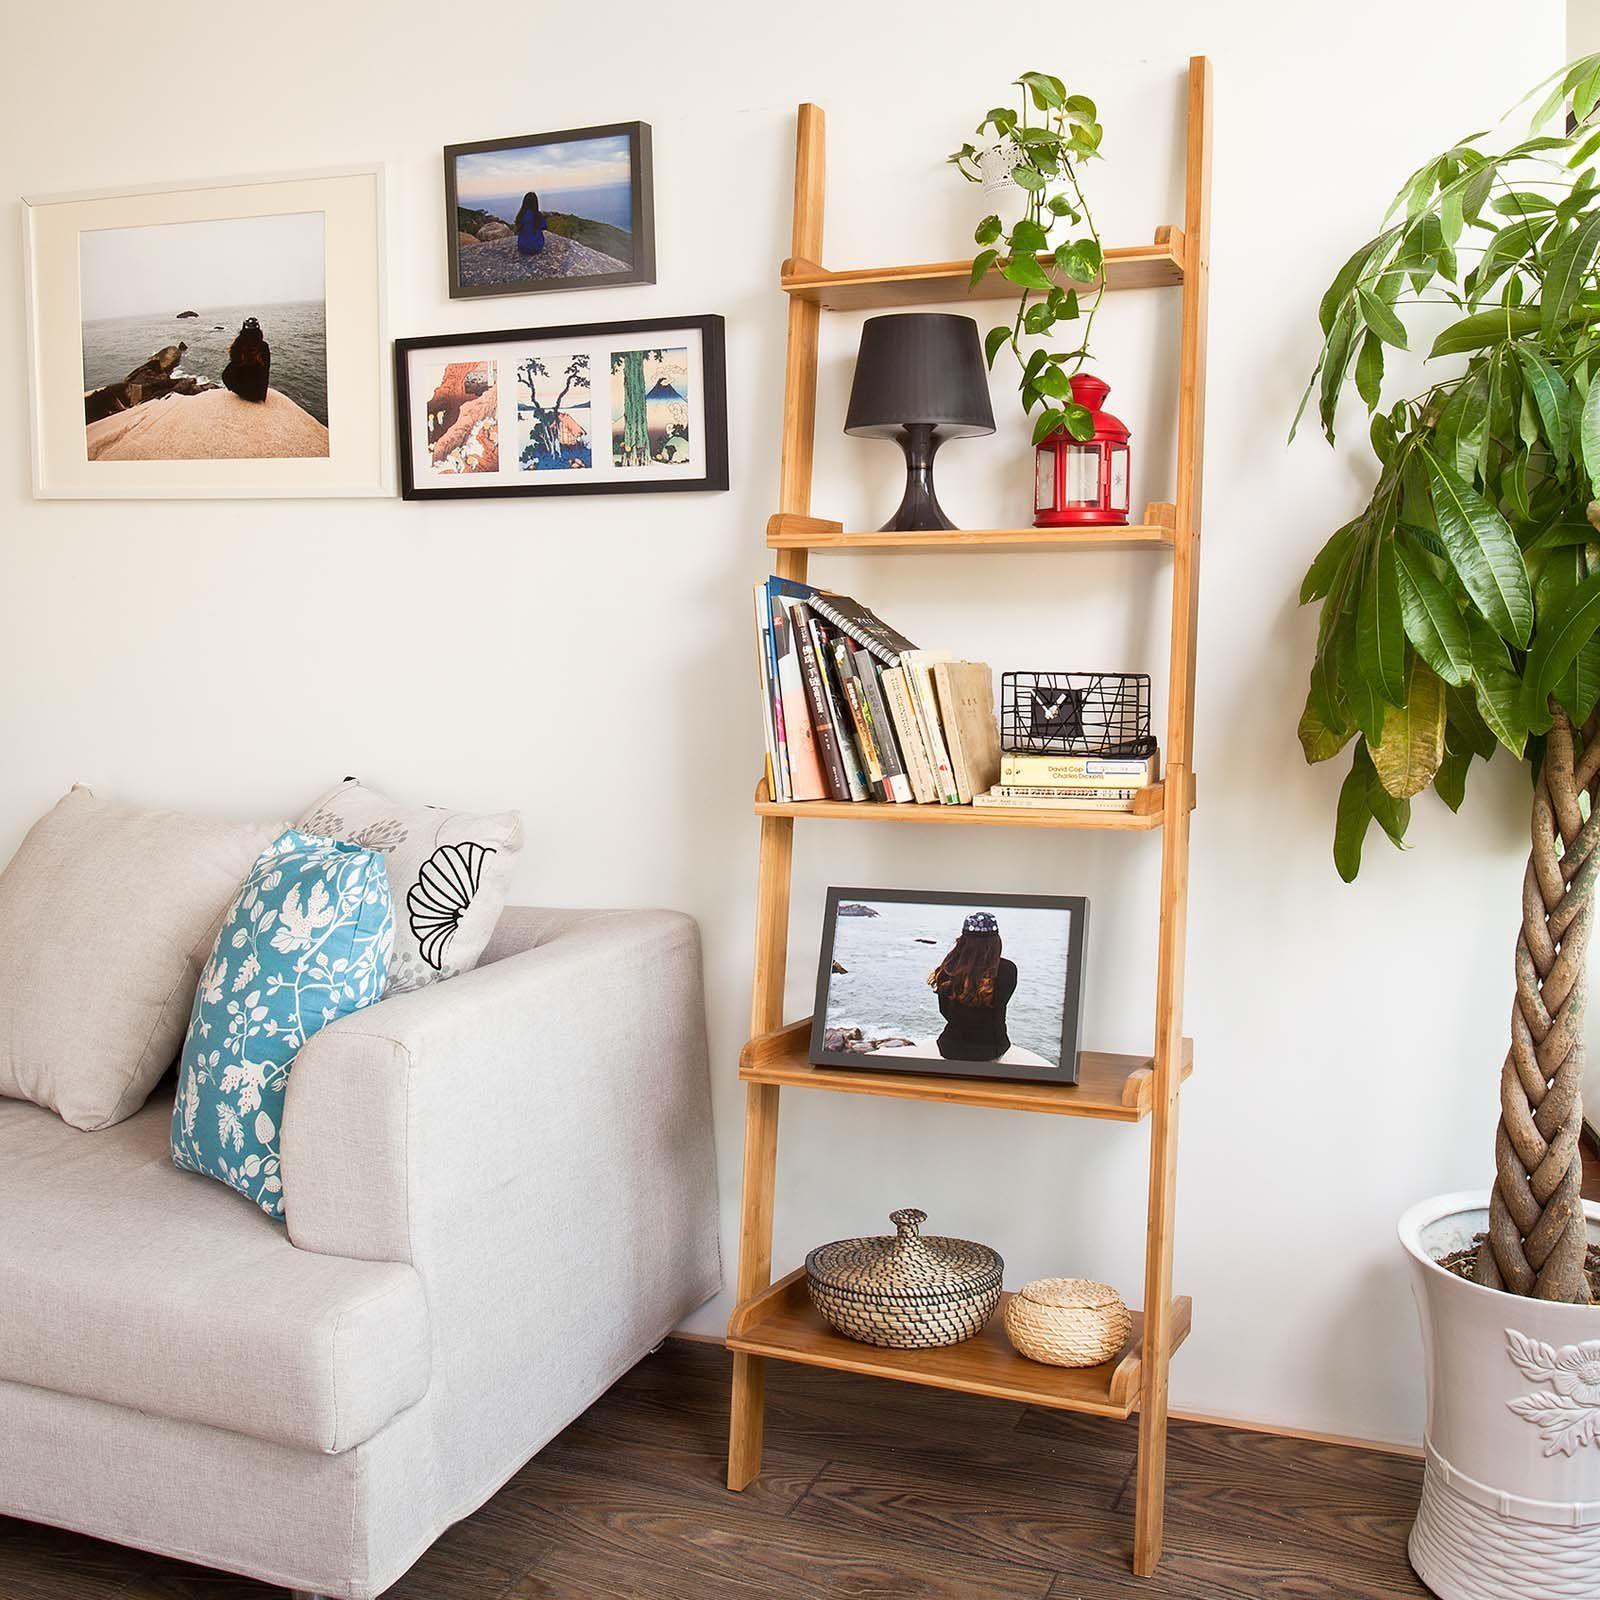 sobuy bambusregal wandregal badregal leiterregal standregal b cherregal frg17 b n amazon. Black Bedroom Furniture Sets. Home Design Ideas